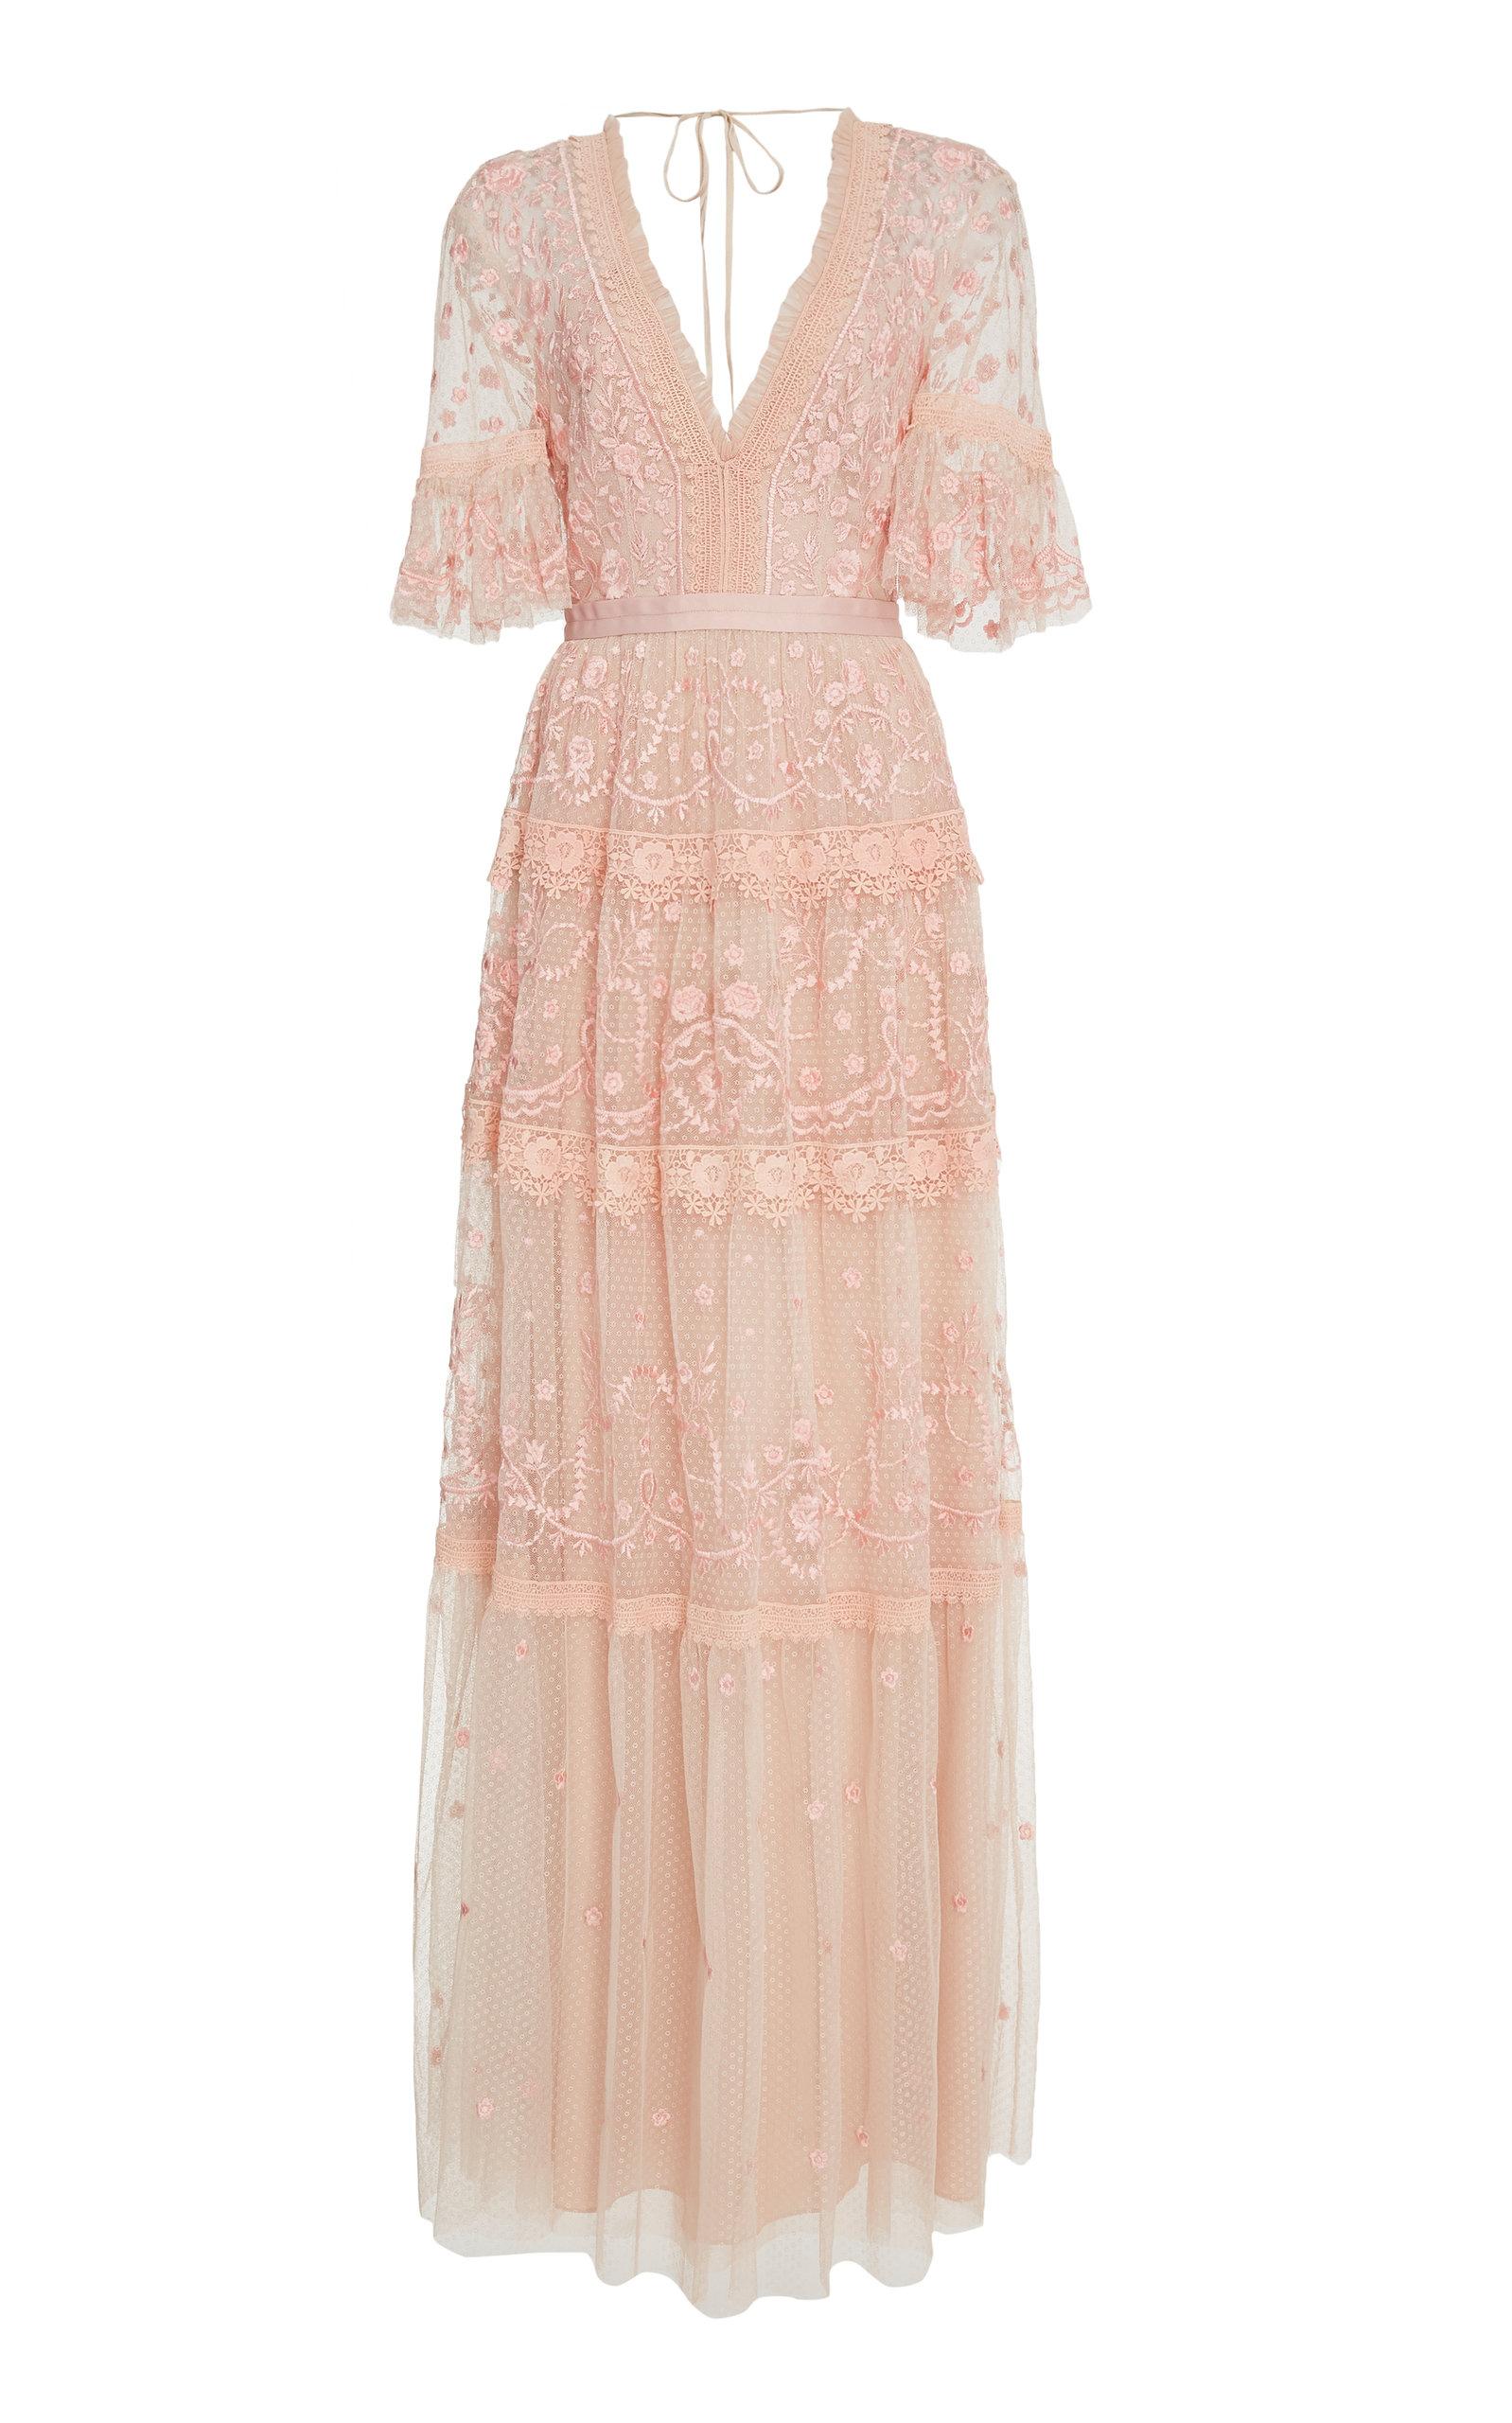 41100a223b0e Midsummer lace gown by Needle & Thread | Moda Operandi